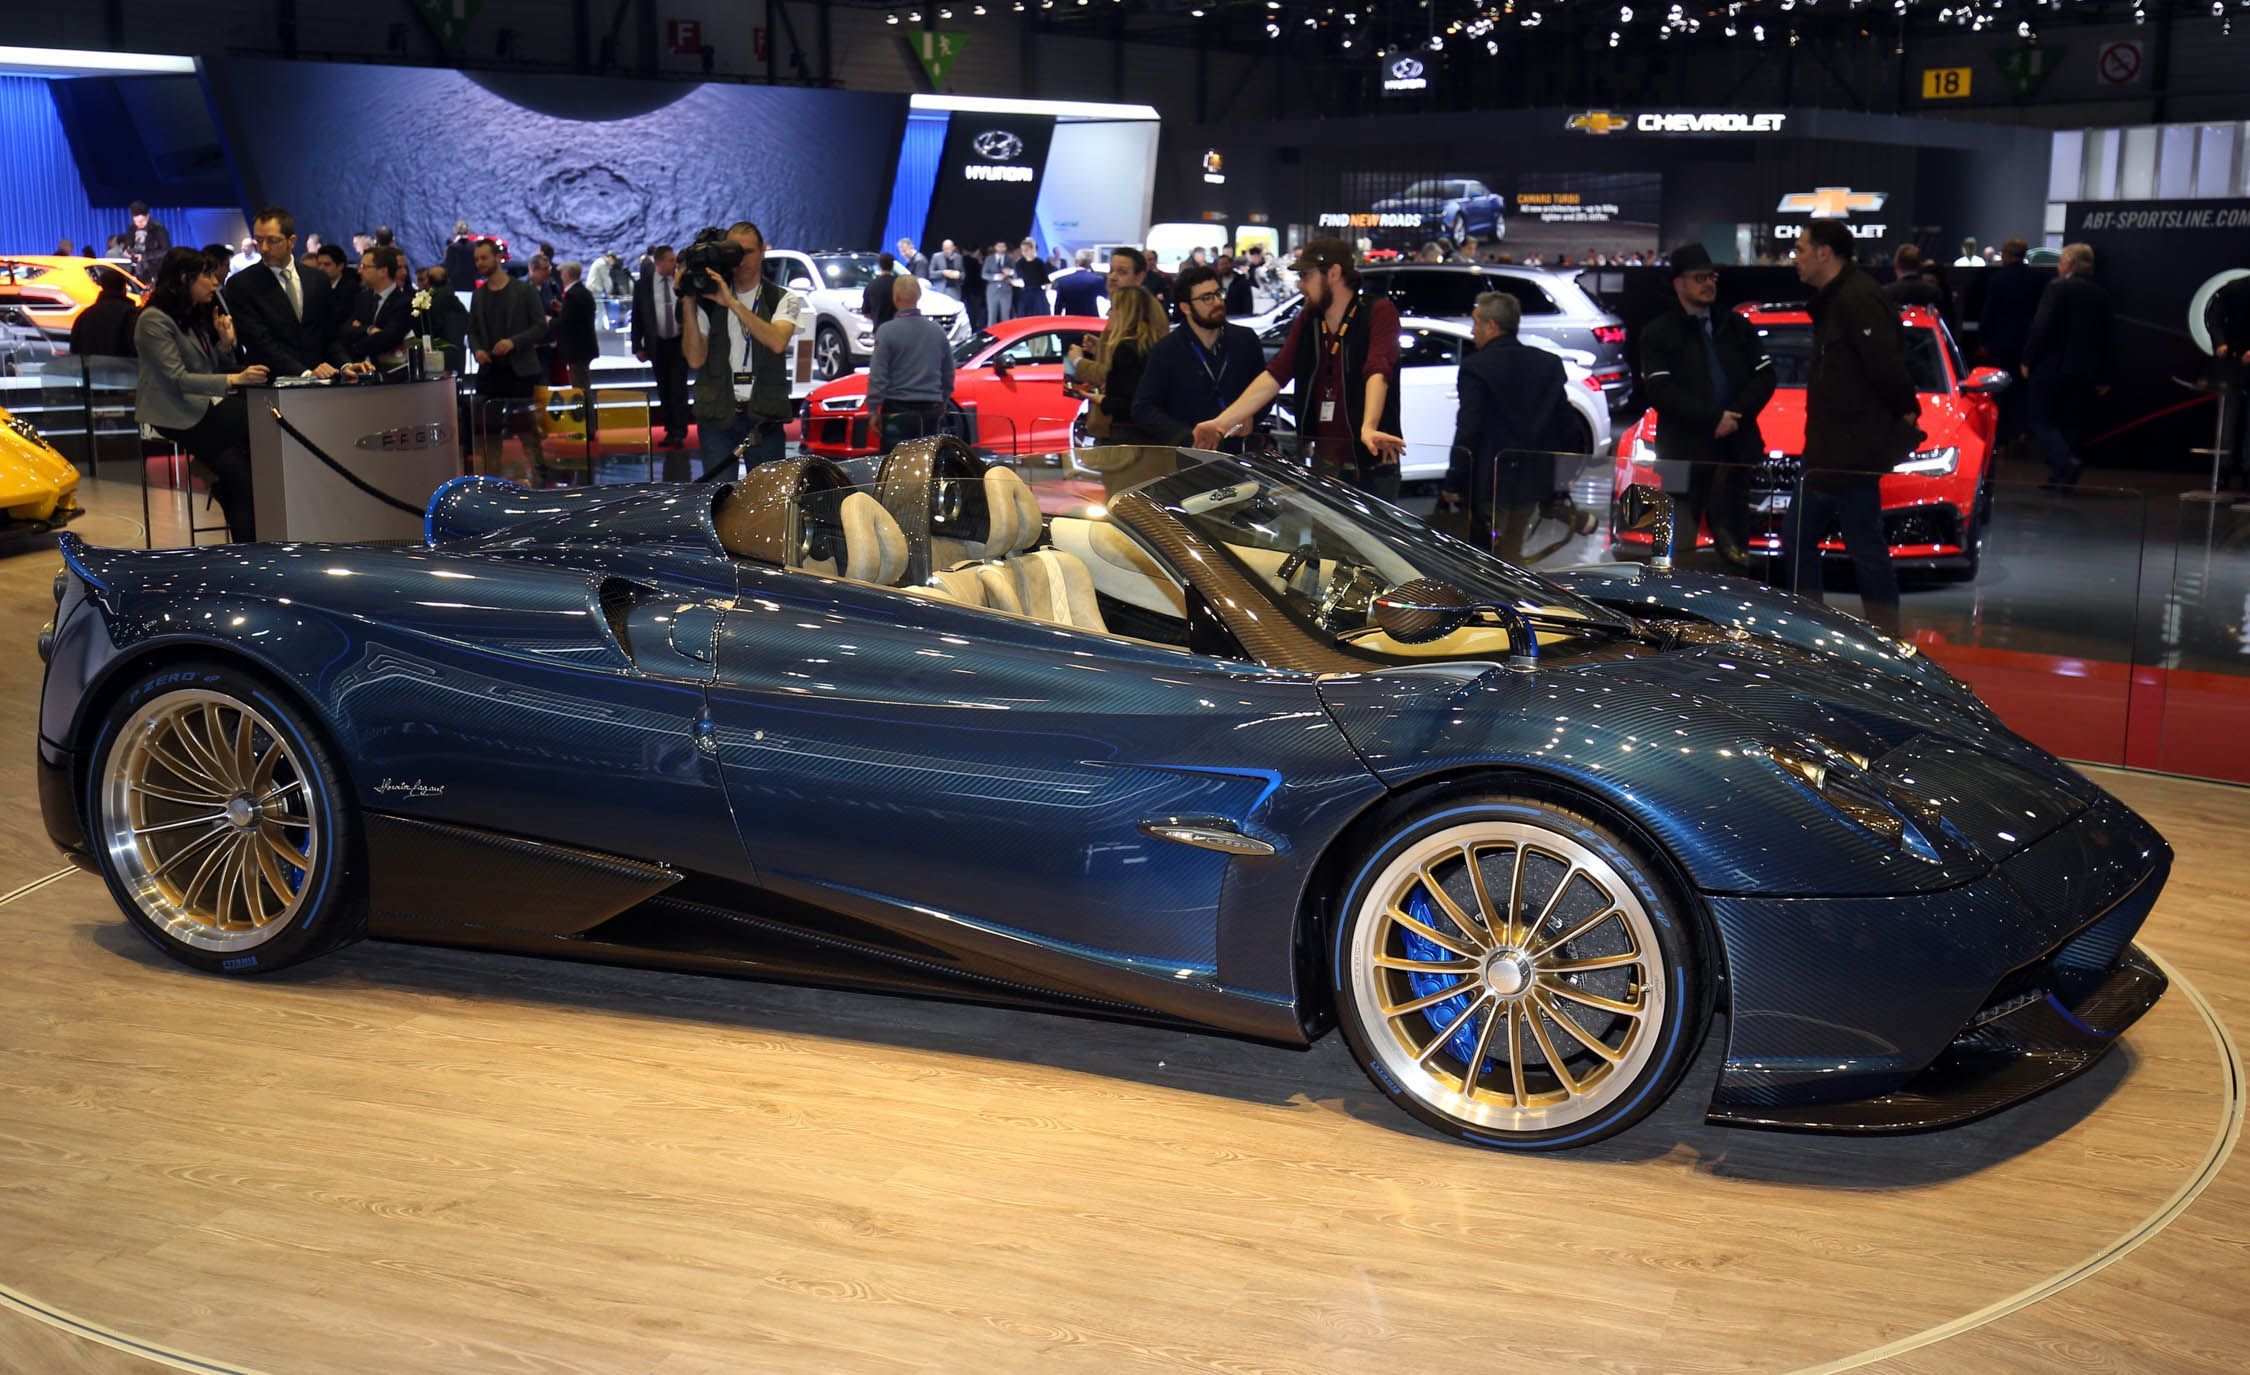 Pagani Huayra Reviews | Pagani Huayra Price, Photos, and Specs | Car